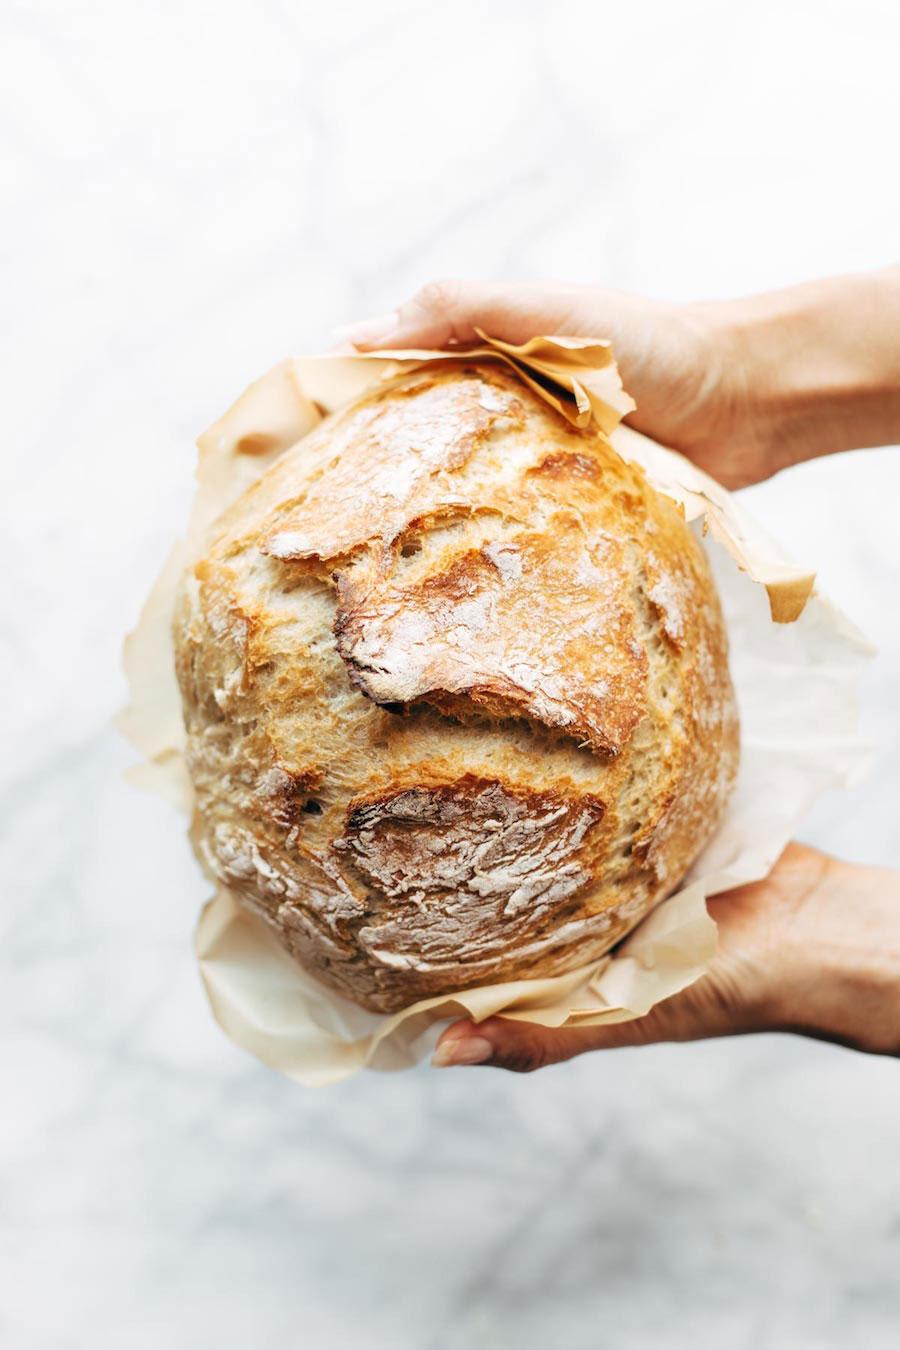 brood maken - brood bakken - brood recept - no knead brood